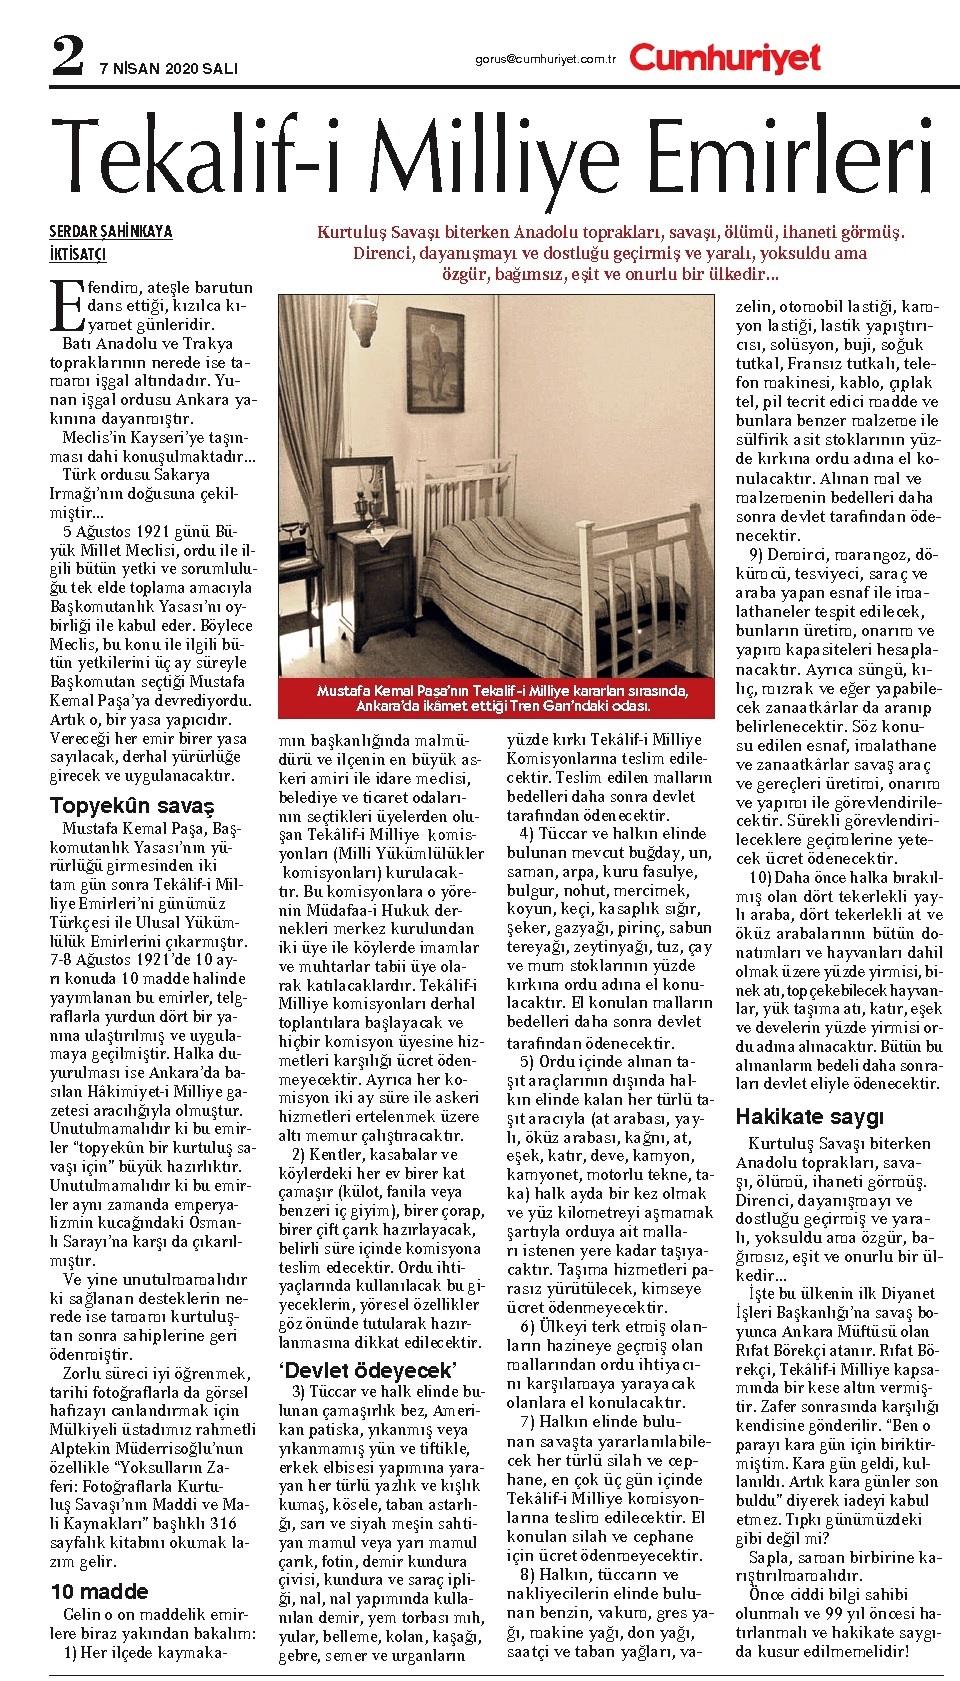 Serdar Şahinkaya-TEKALİF-İ MİLLİYE EMİRLERİ-Cumhuriyet Gazete-7 Nisan 2020